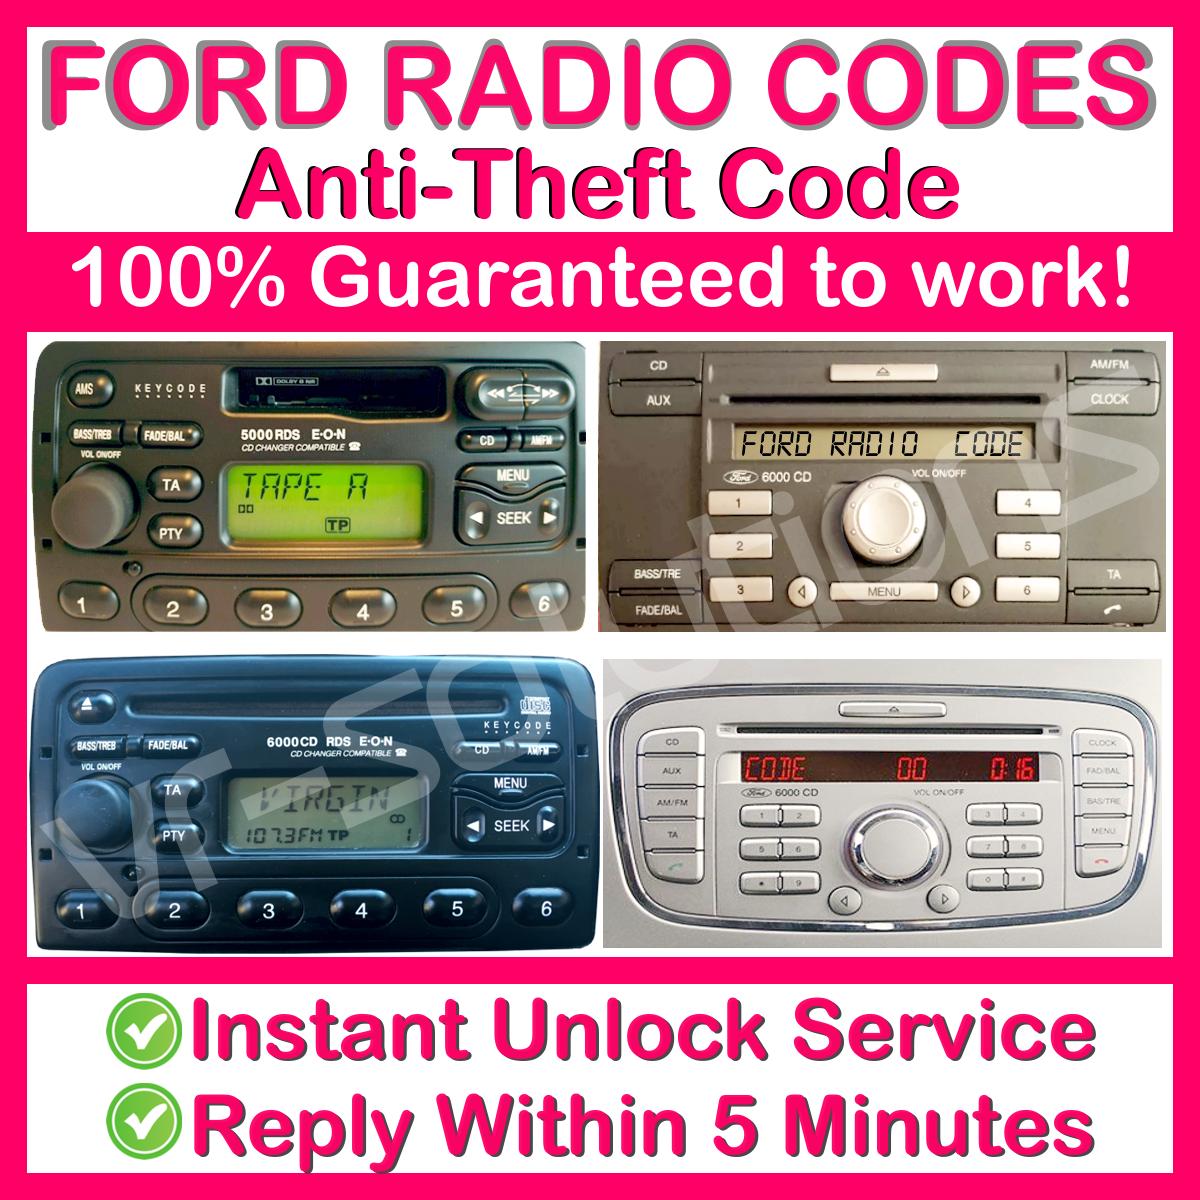 FORD ESCORT PUMA FOCUS COUGAR MONDEO FIESTA 6000 CD PLAYER RADIO CODE WARRANTY